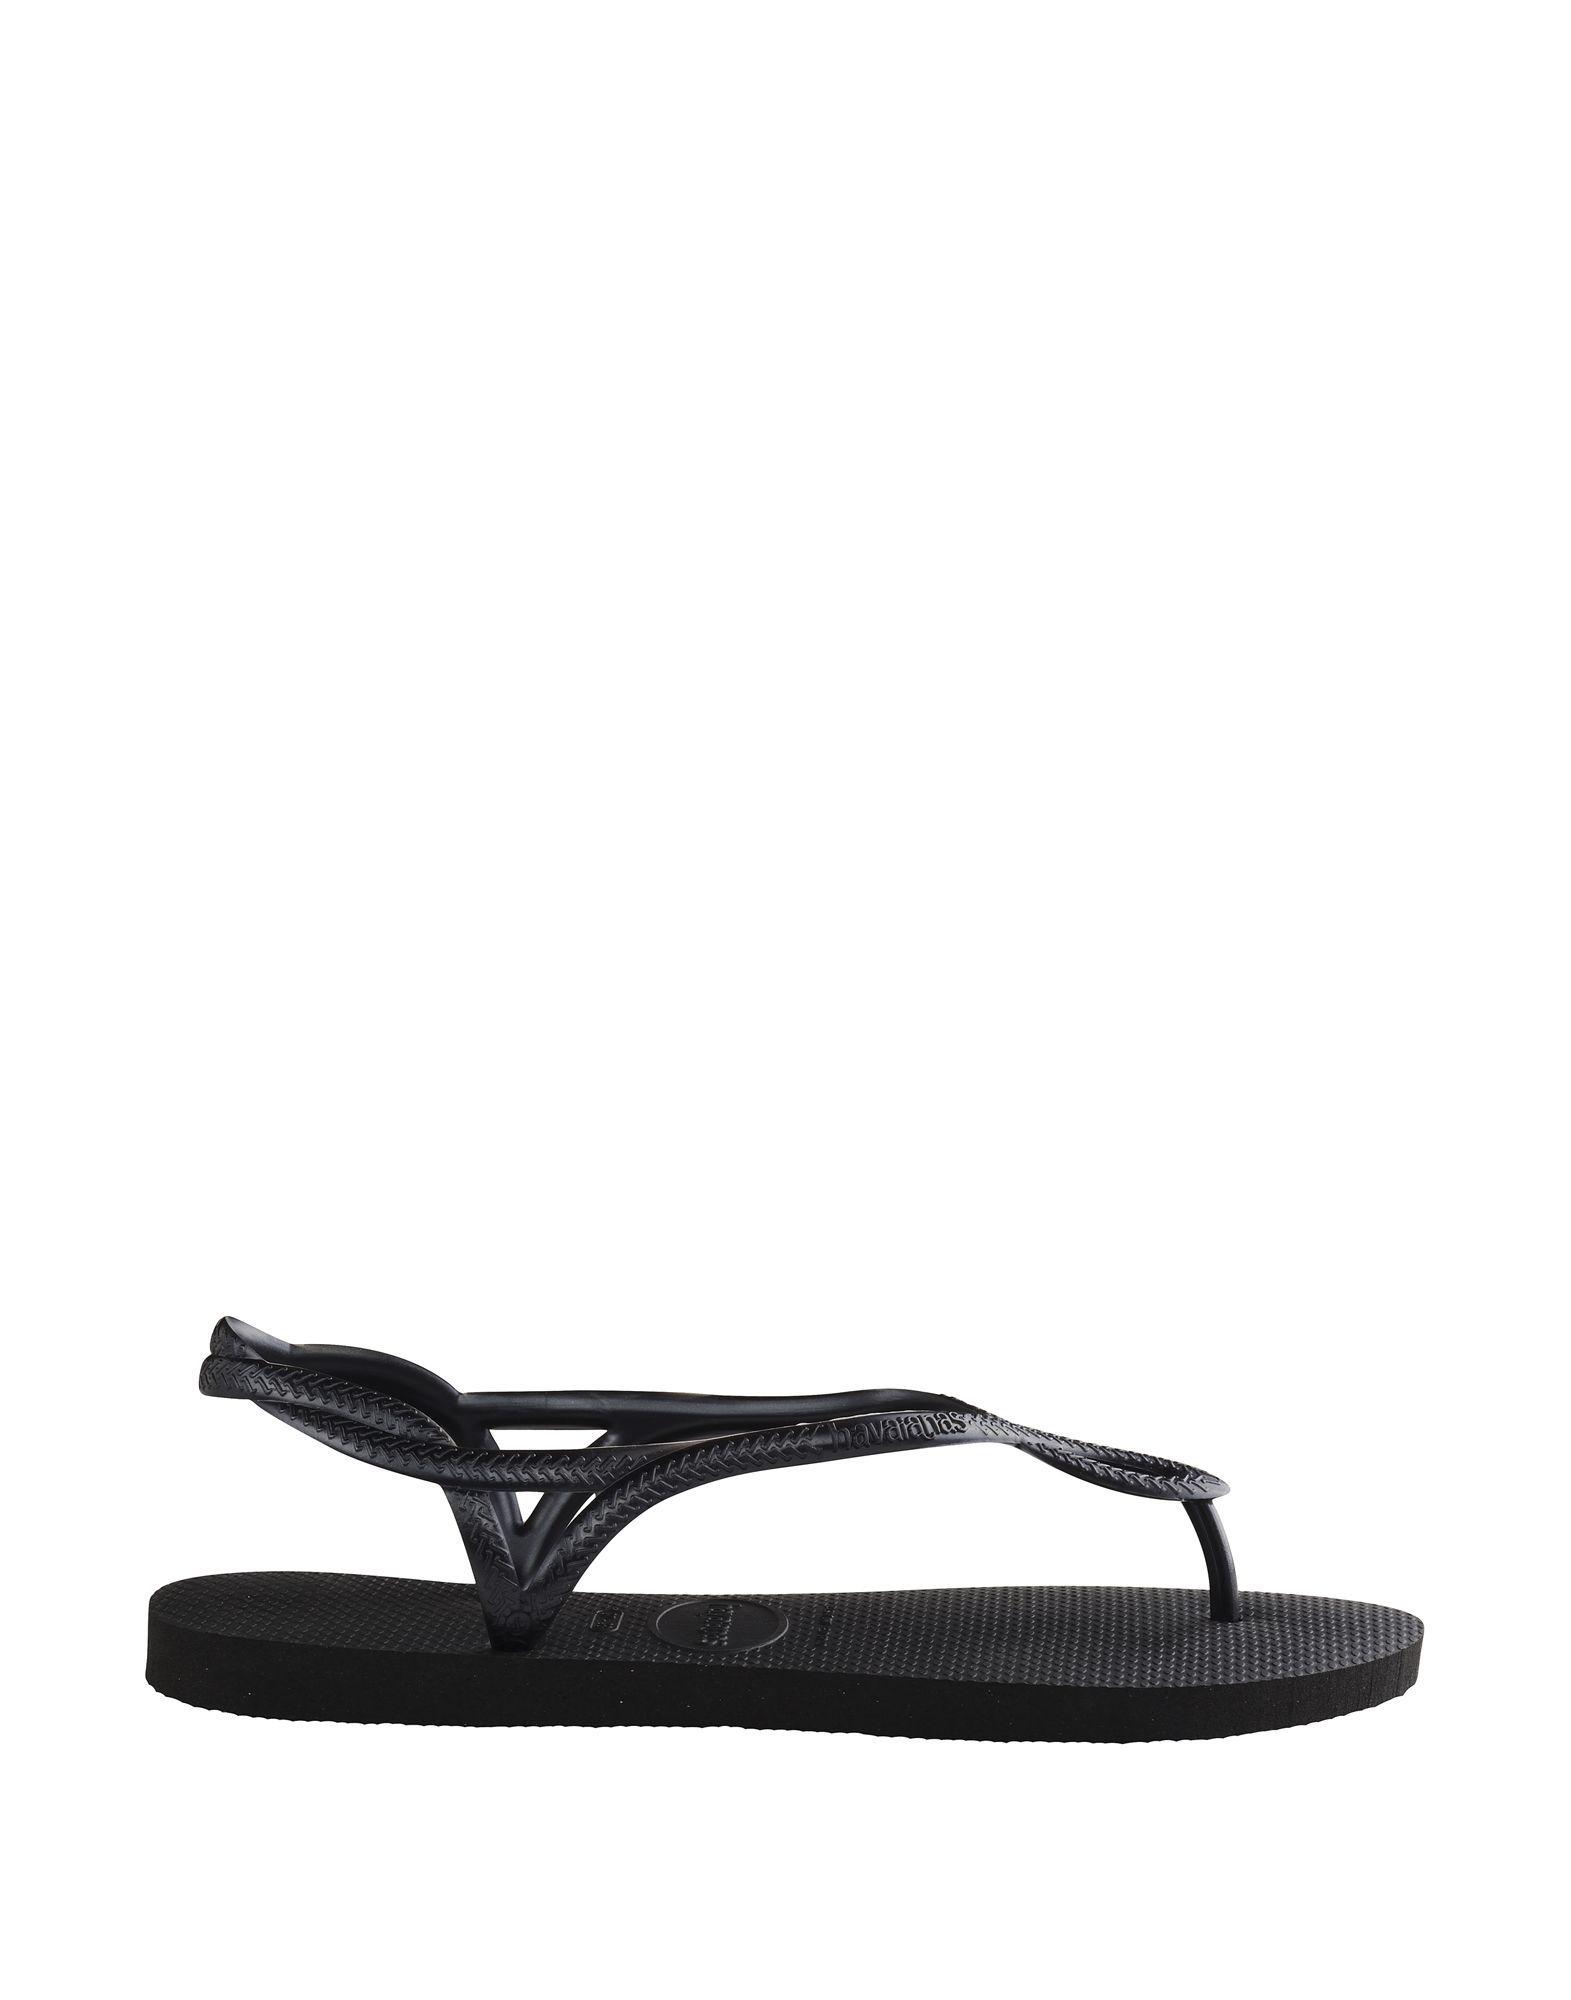 Havaianas Black Basic Flip Flop Sandals